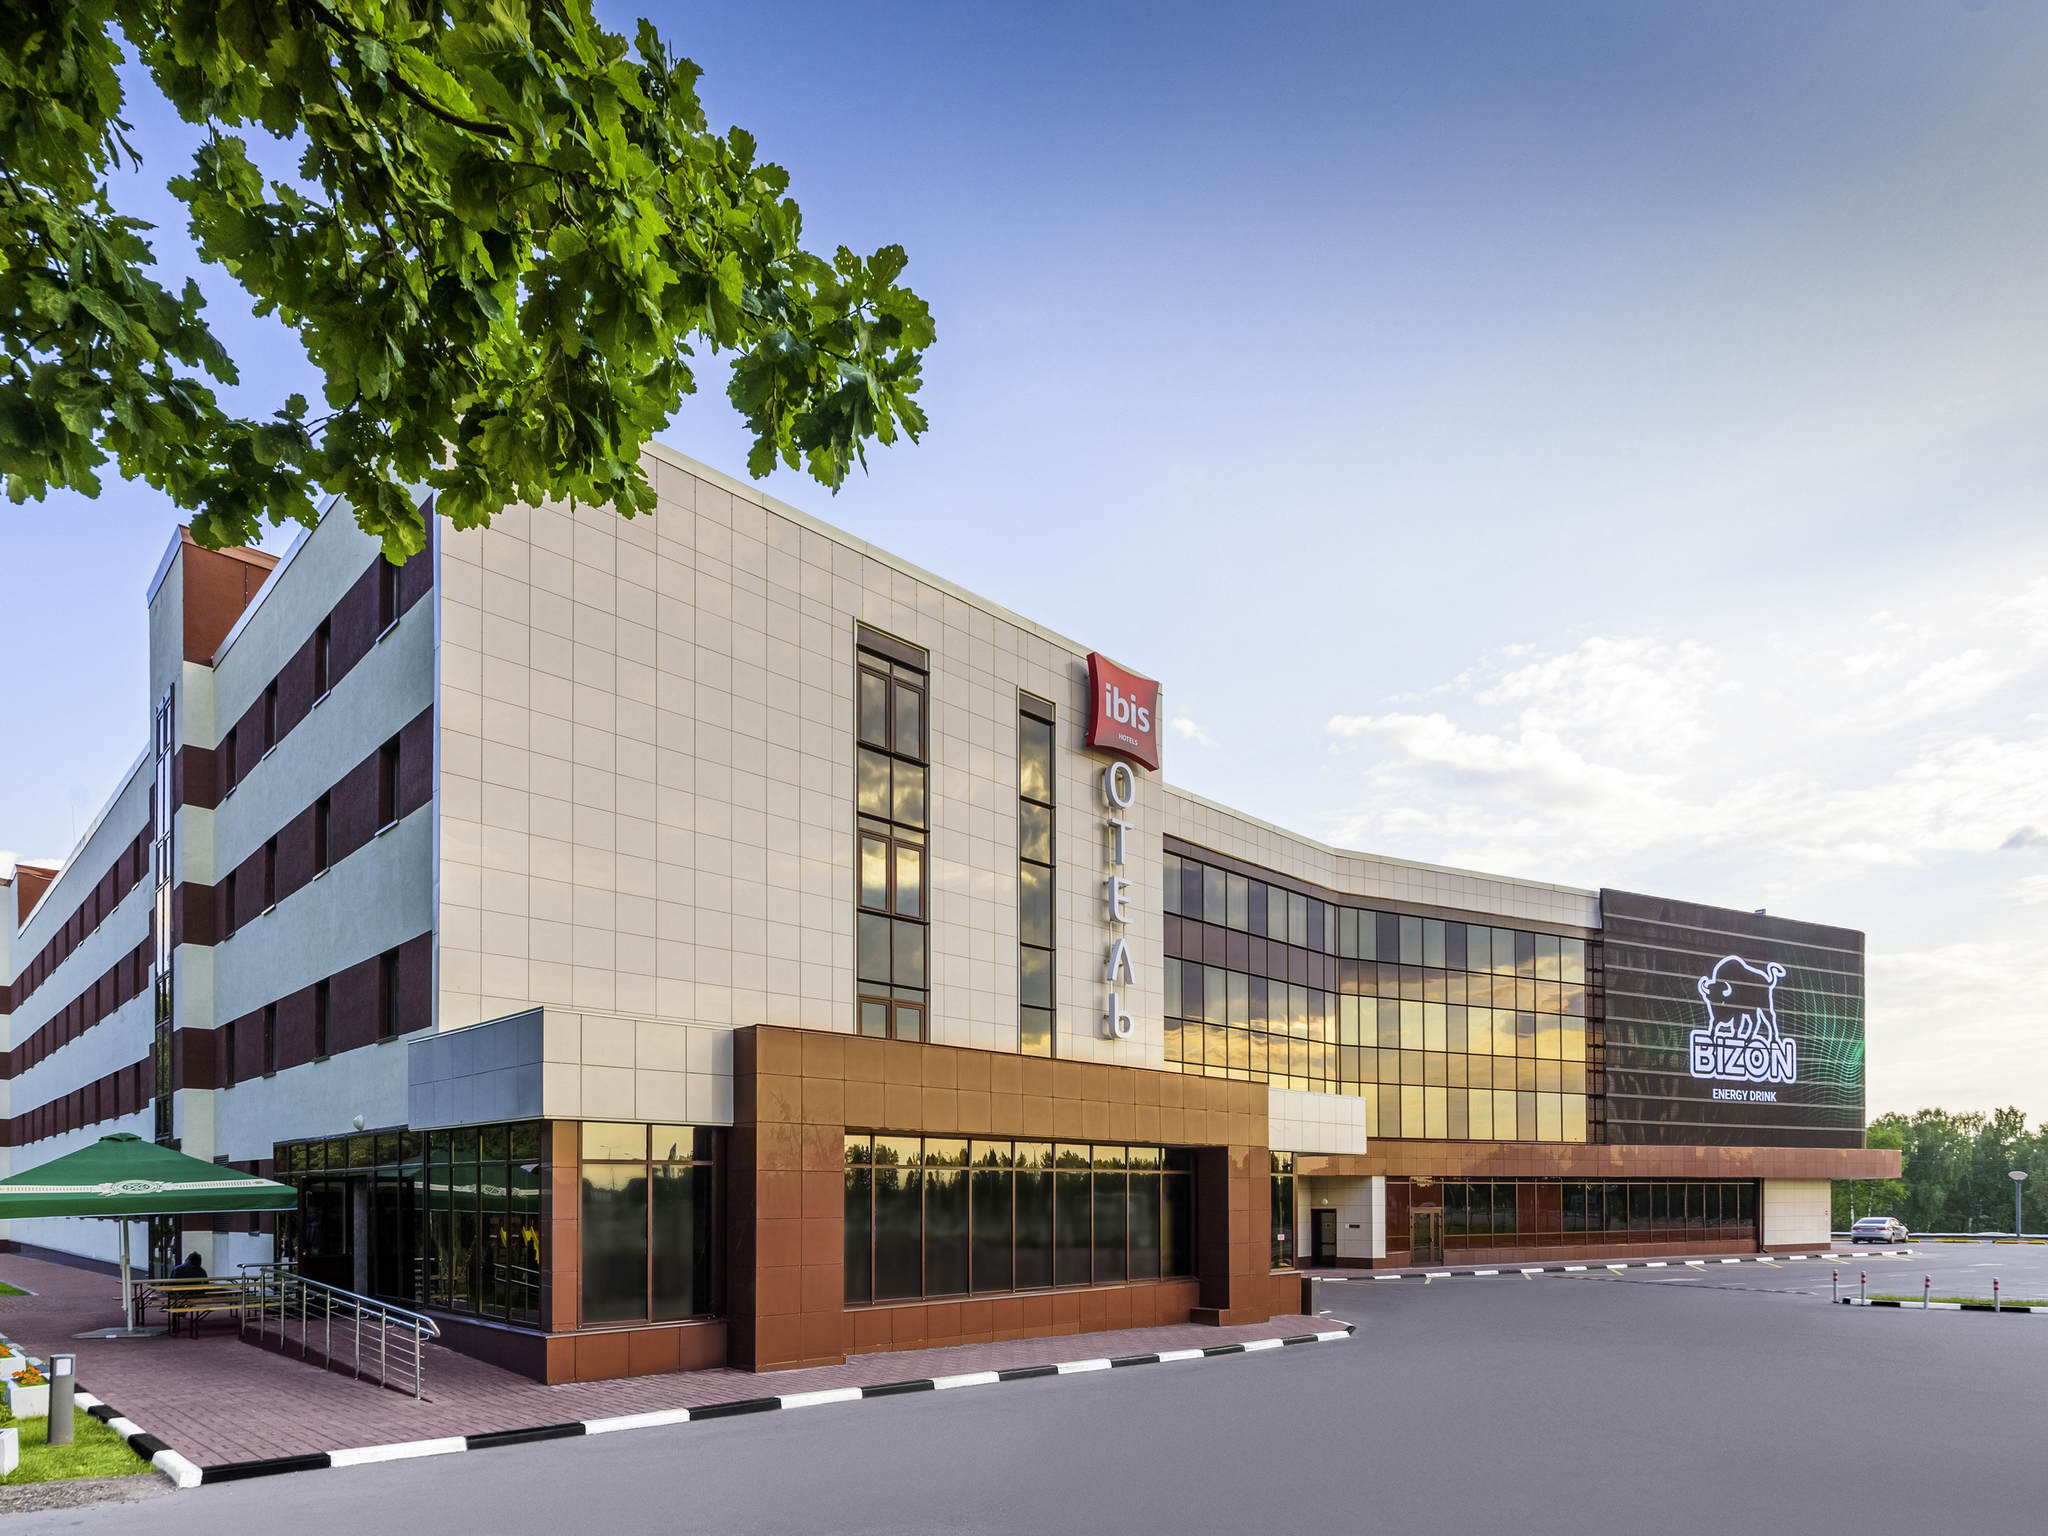 فندق - فندق إيبيس ibis موسكو دوموديدوفو إيربورت